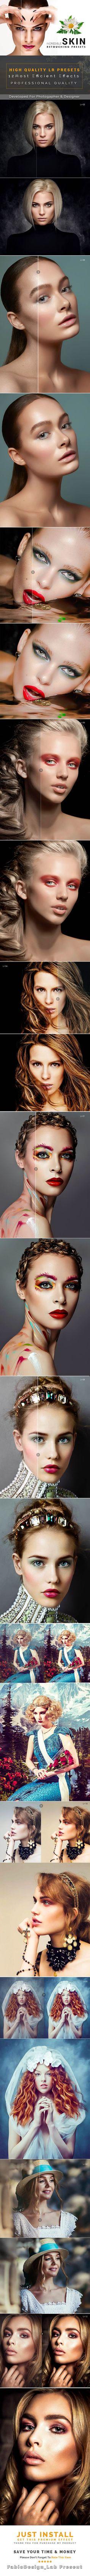 Incredible Skin Retouching Lightroom Preset #photoeffect